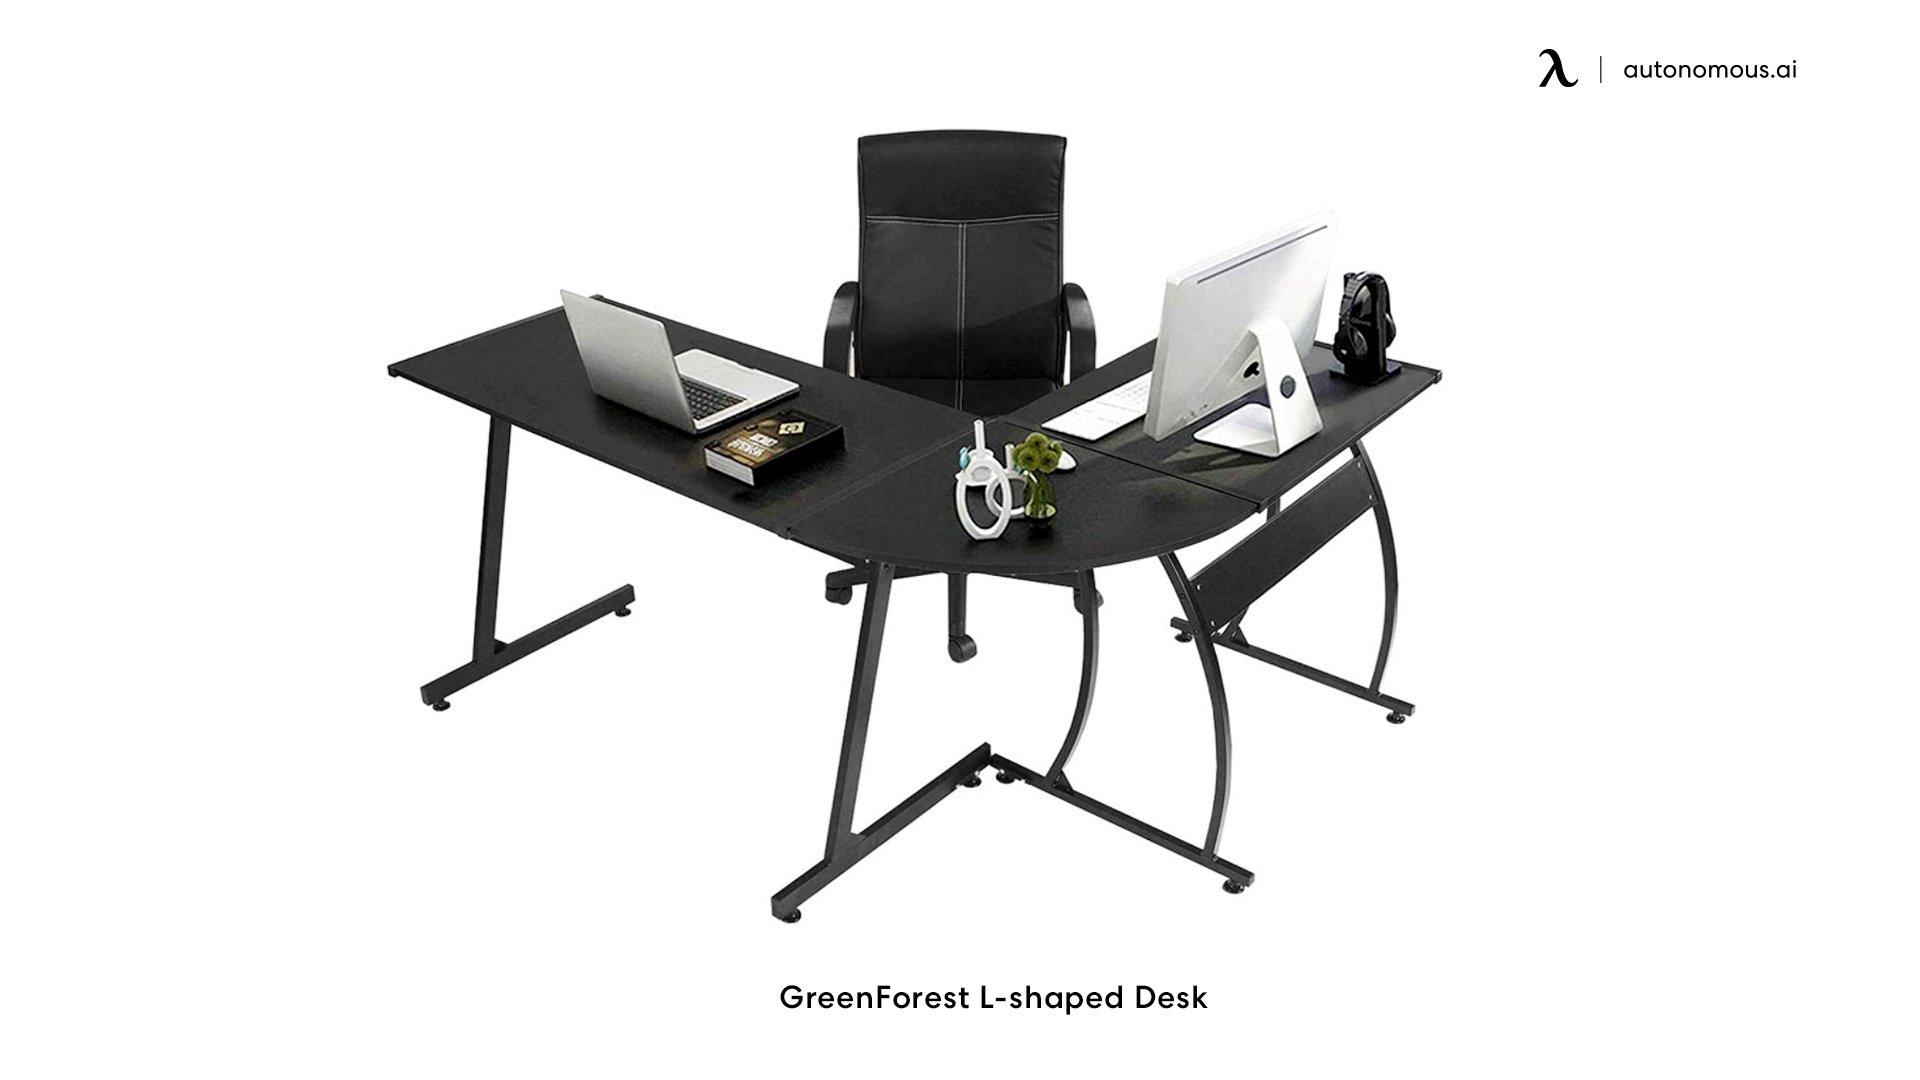 GreenForest Corner standing desk